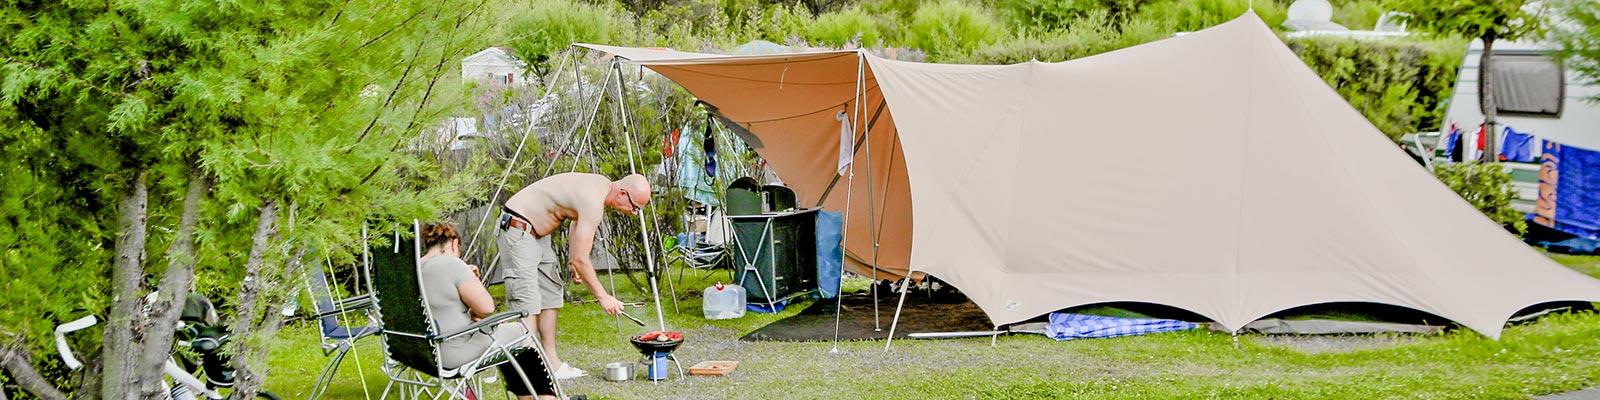 vacances st jean de luz camping caristes